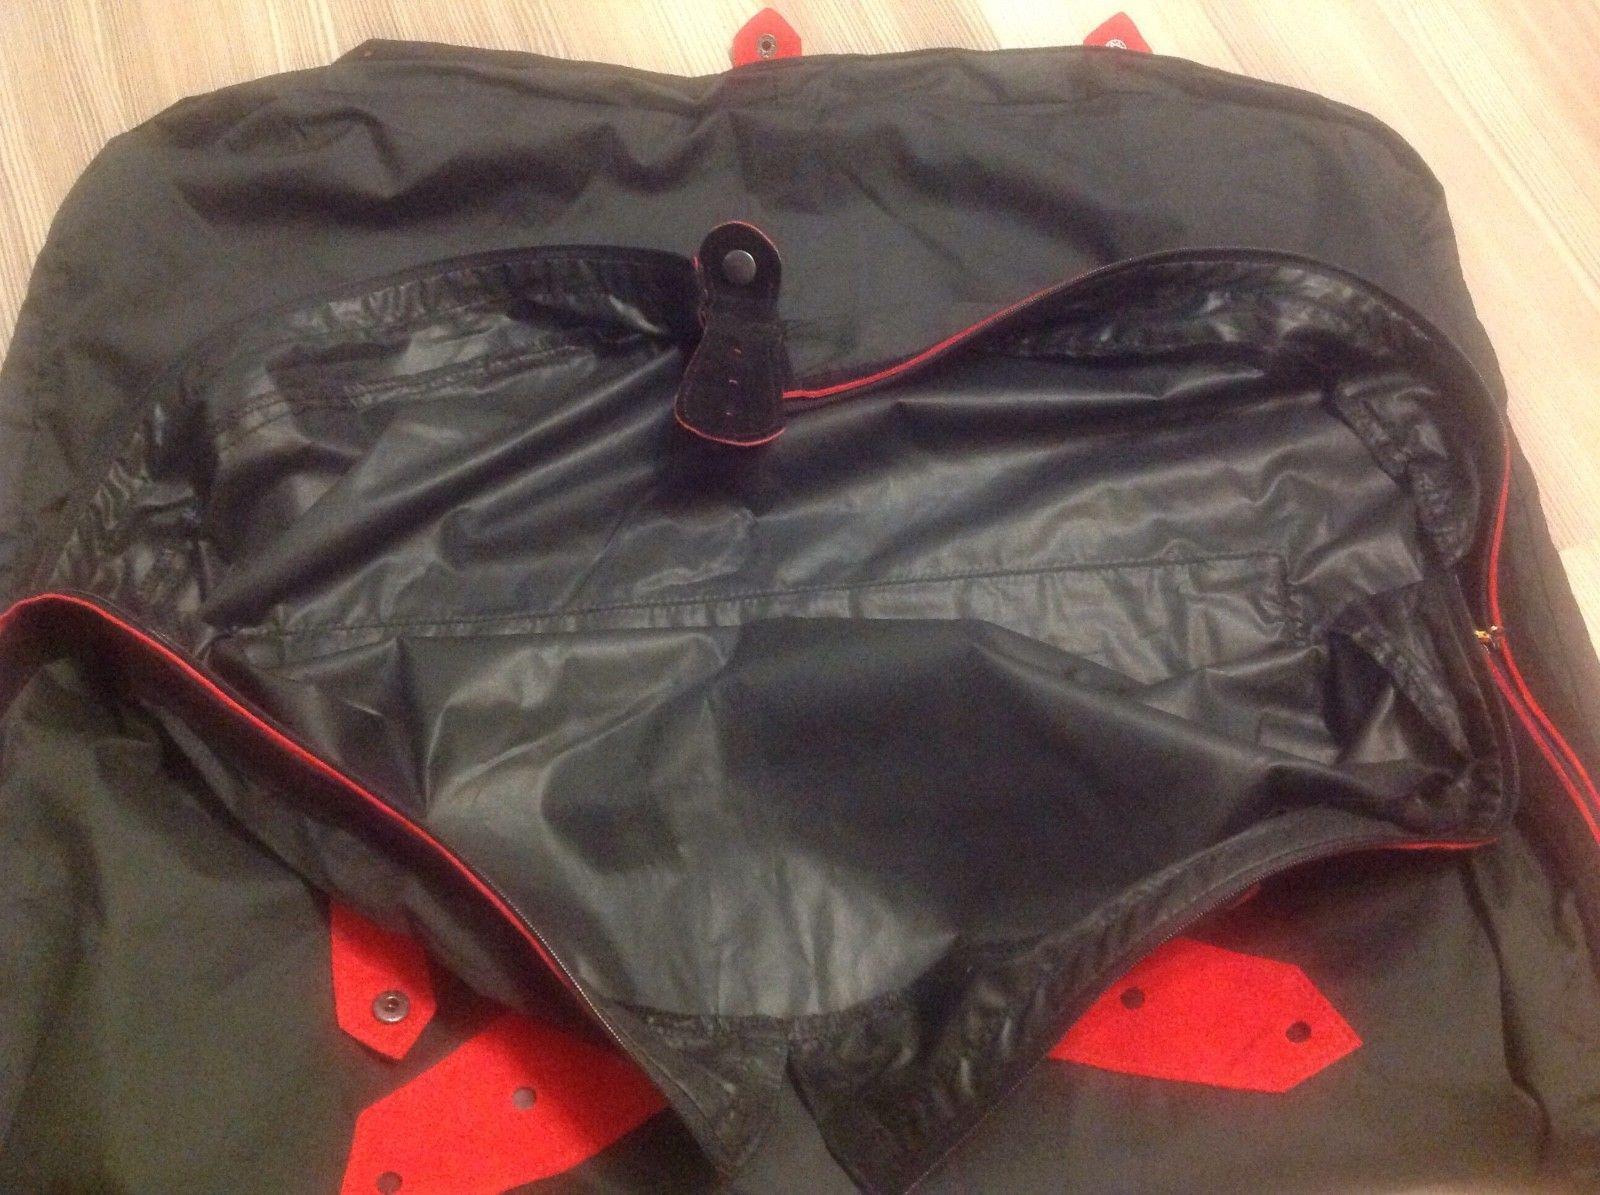 Zilli - garment bag #A - 07.jpg.jpg